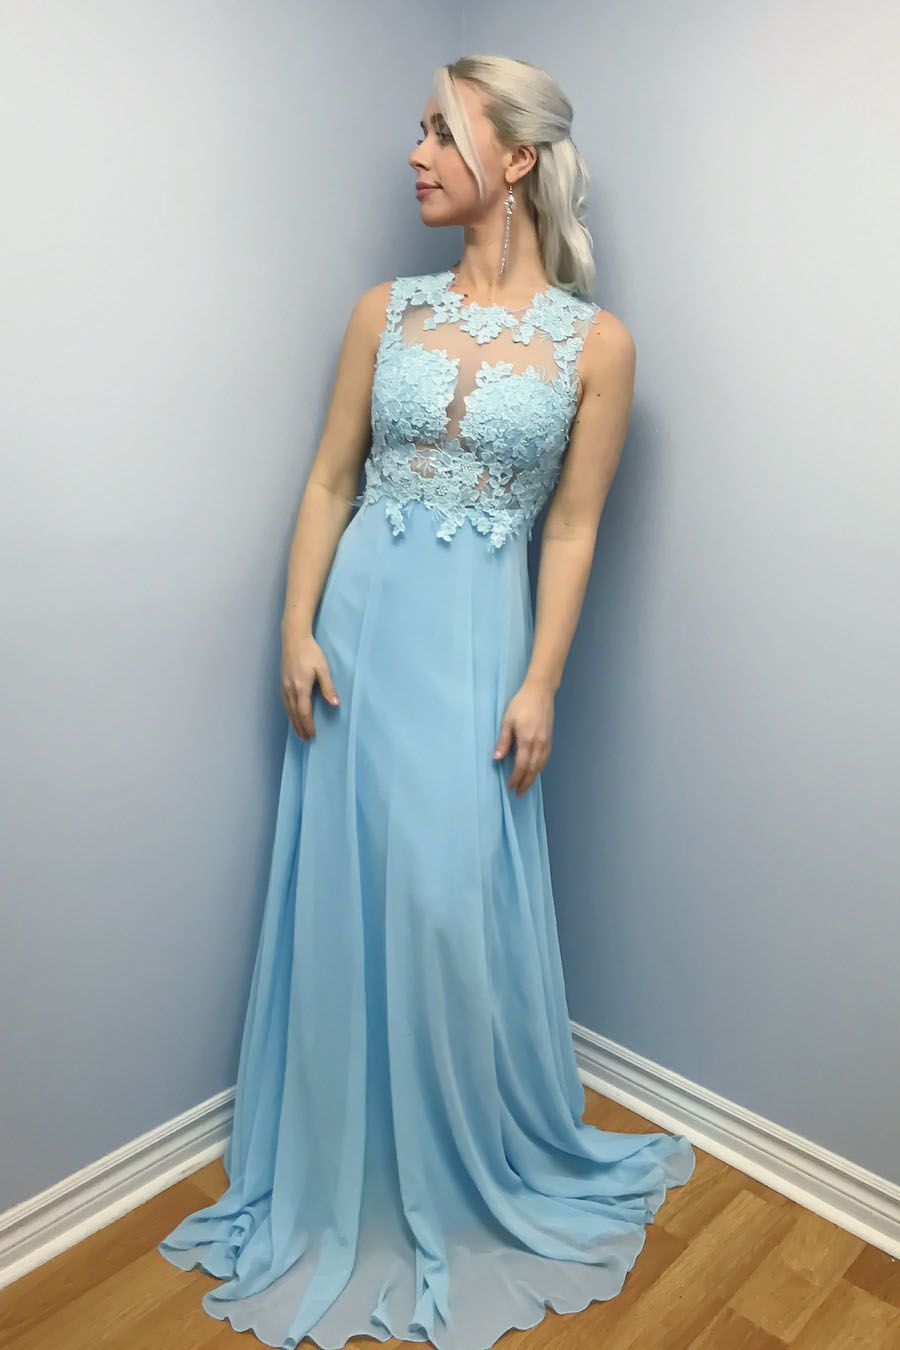 Elegant aline bue chiffon long prom dress fashionista pinterest